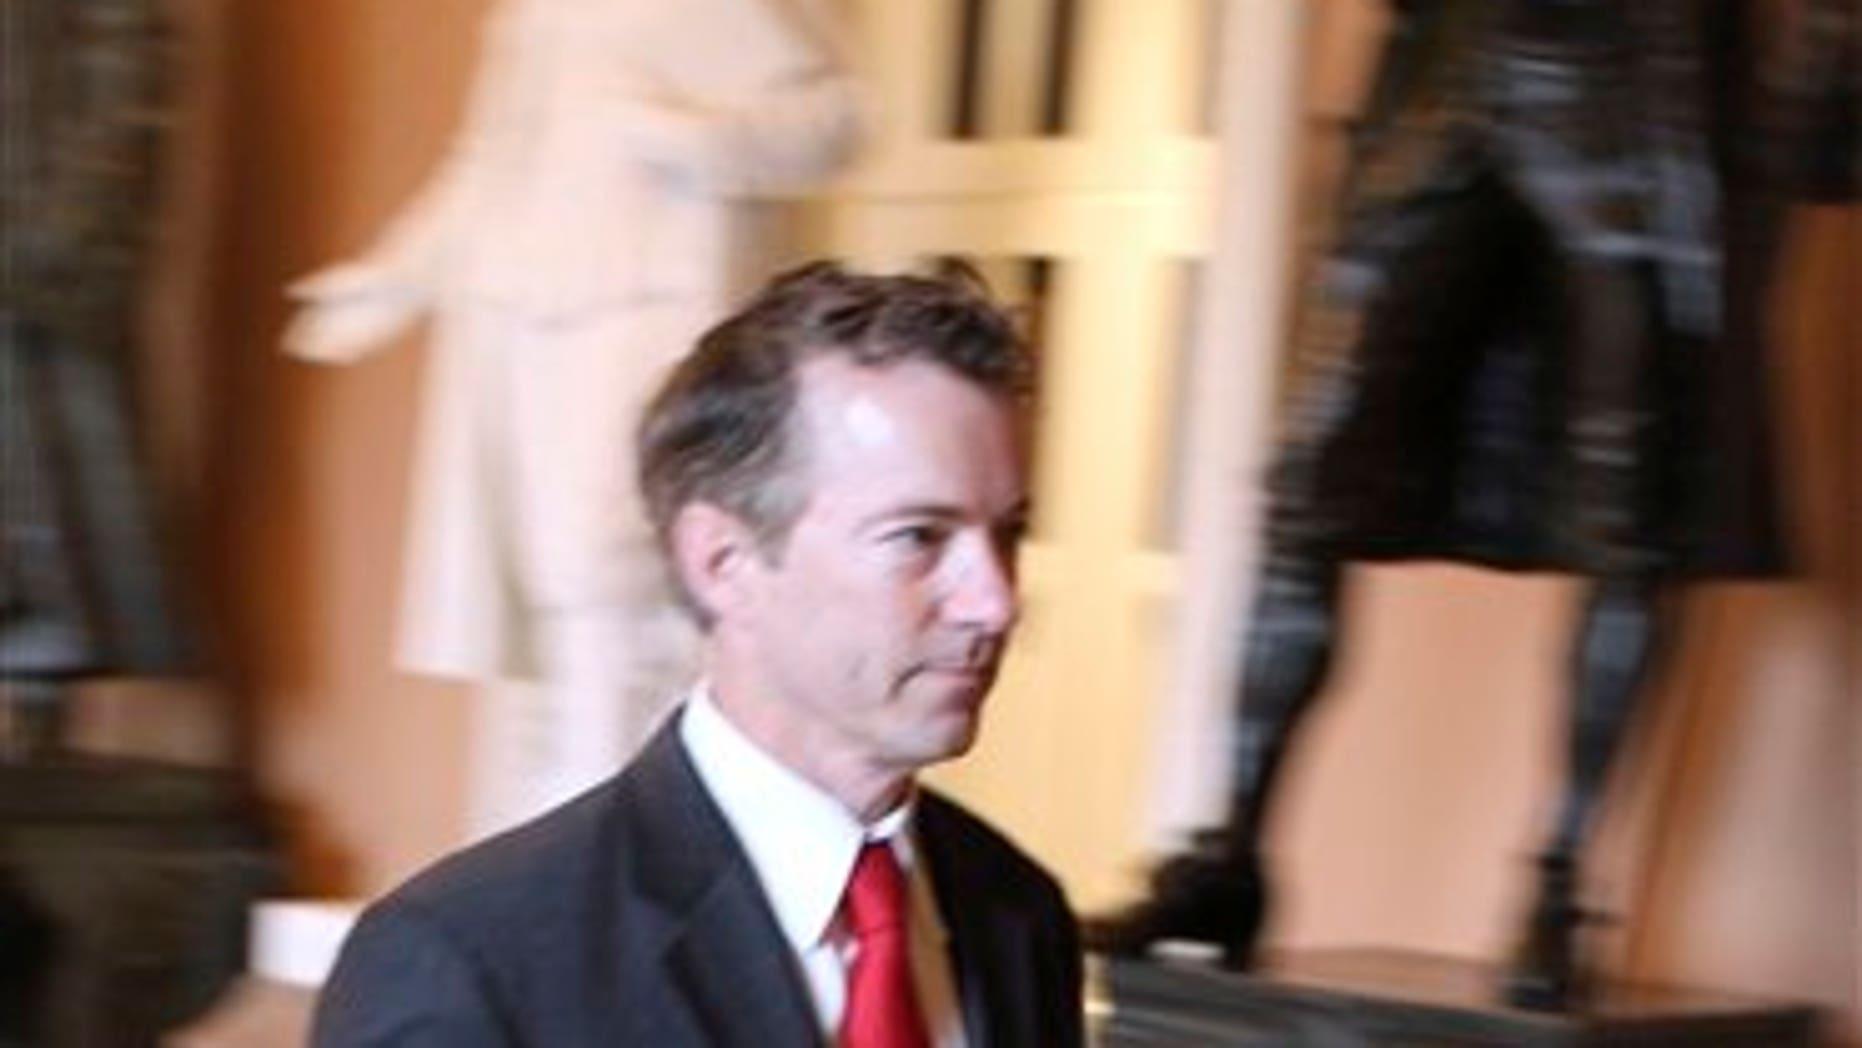 Rand Paul walks through the U.S. Capitol on November 15 (AP Photo/Harry Hamburg)